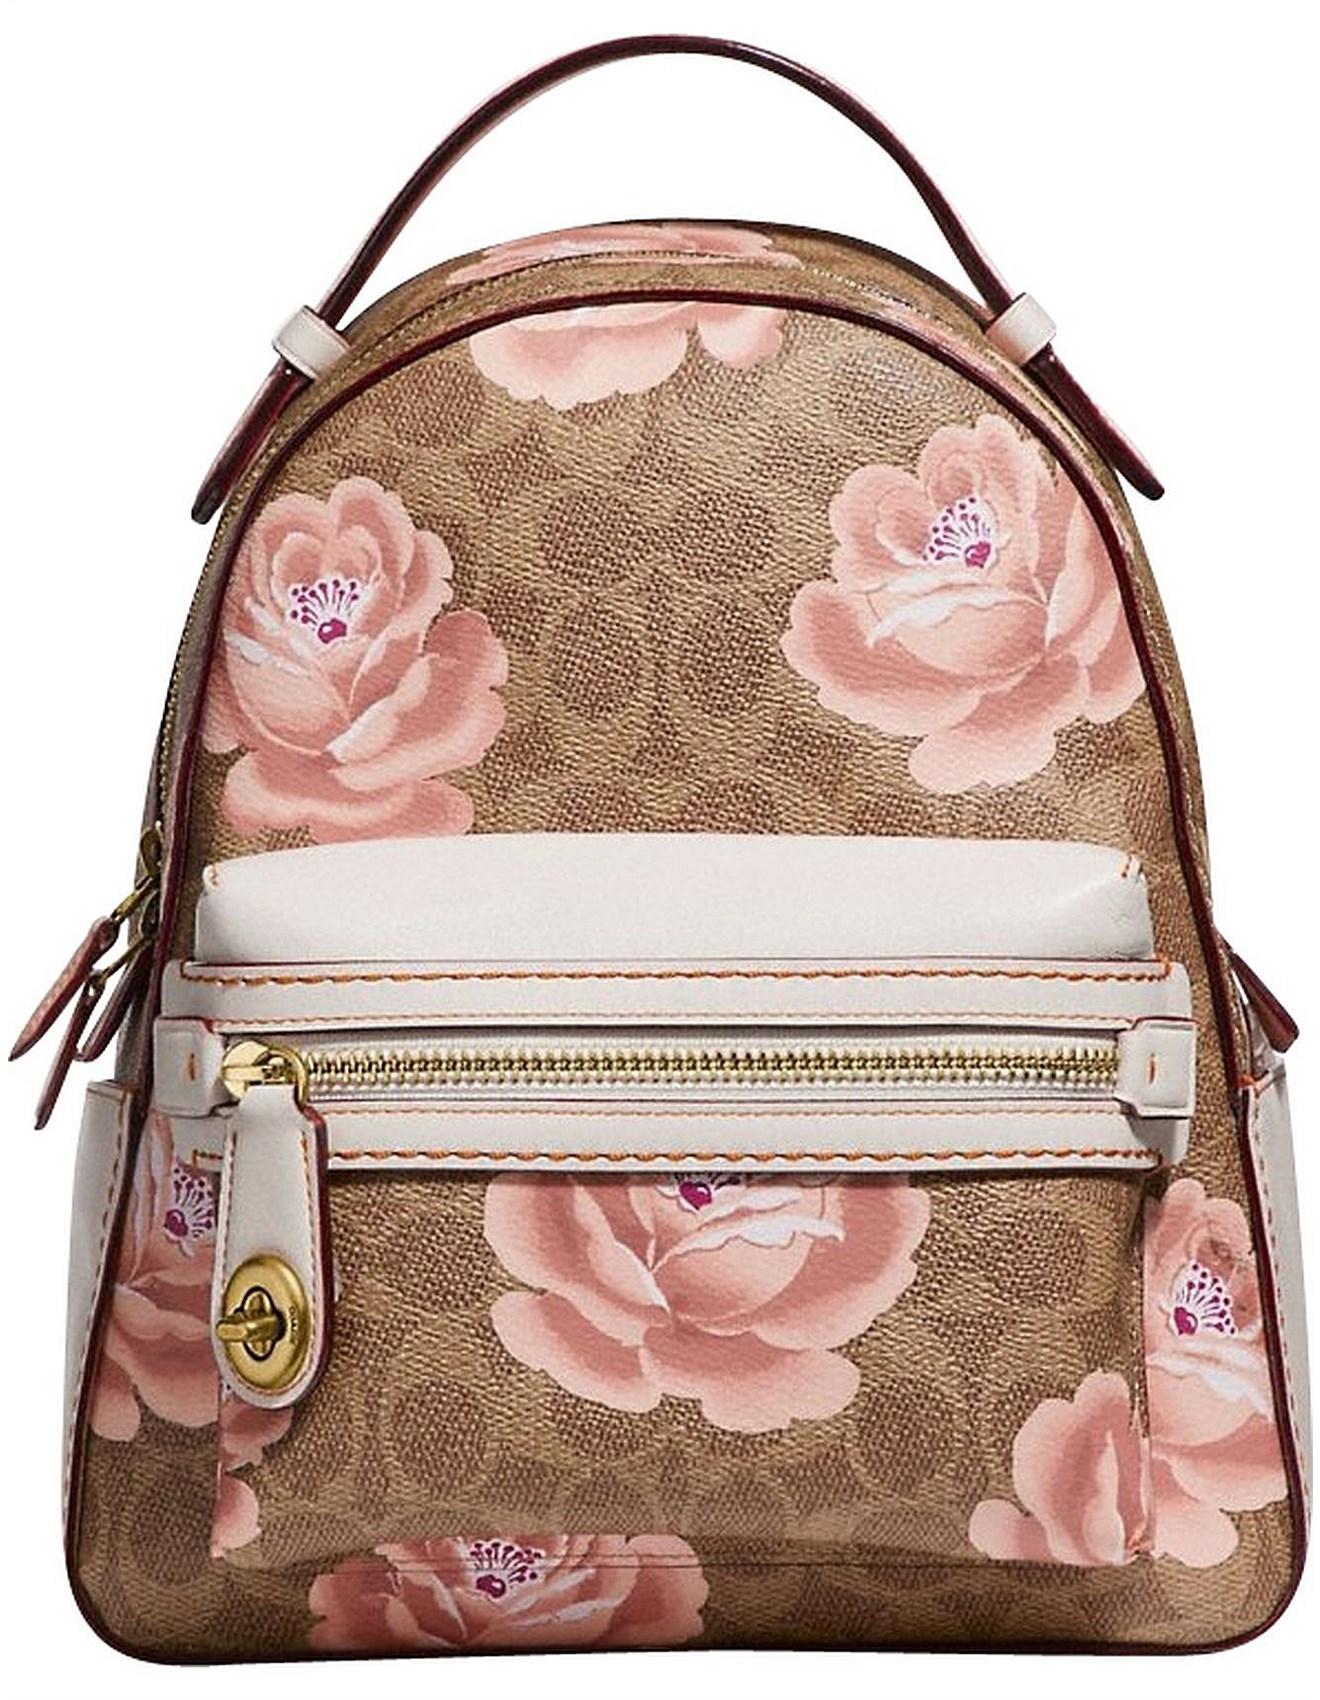 3a69e810a Coach | Buy Coach Bags, Handbags & Wallets Online | David Jones ...